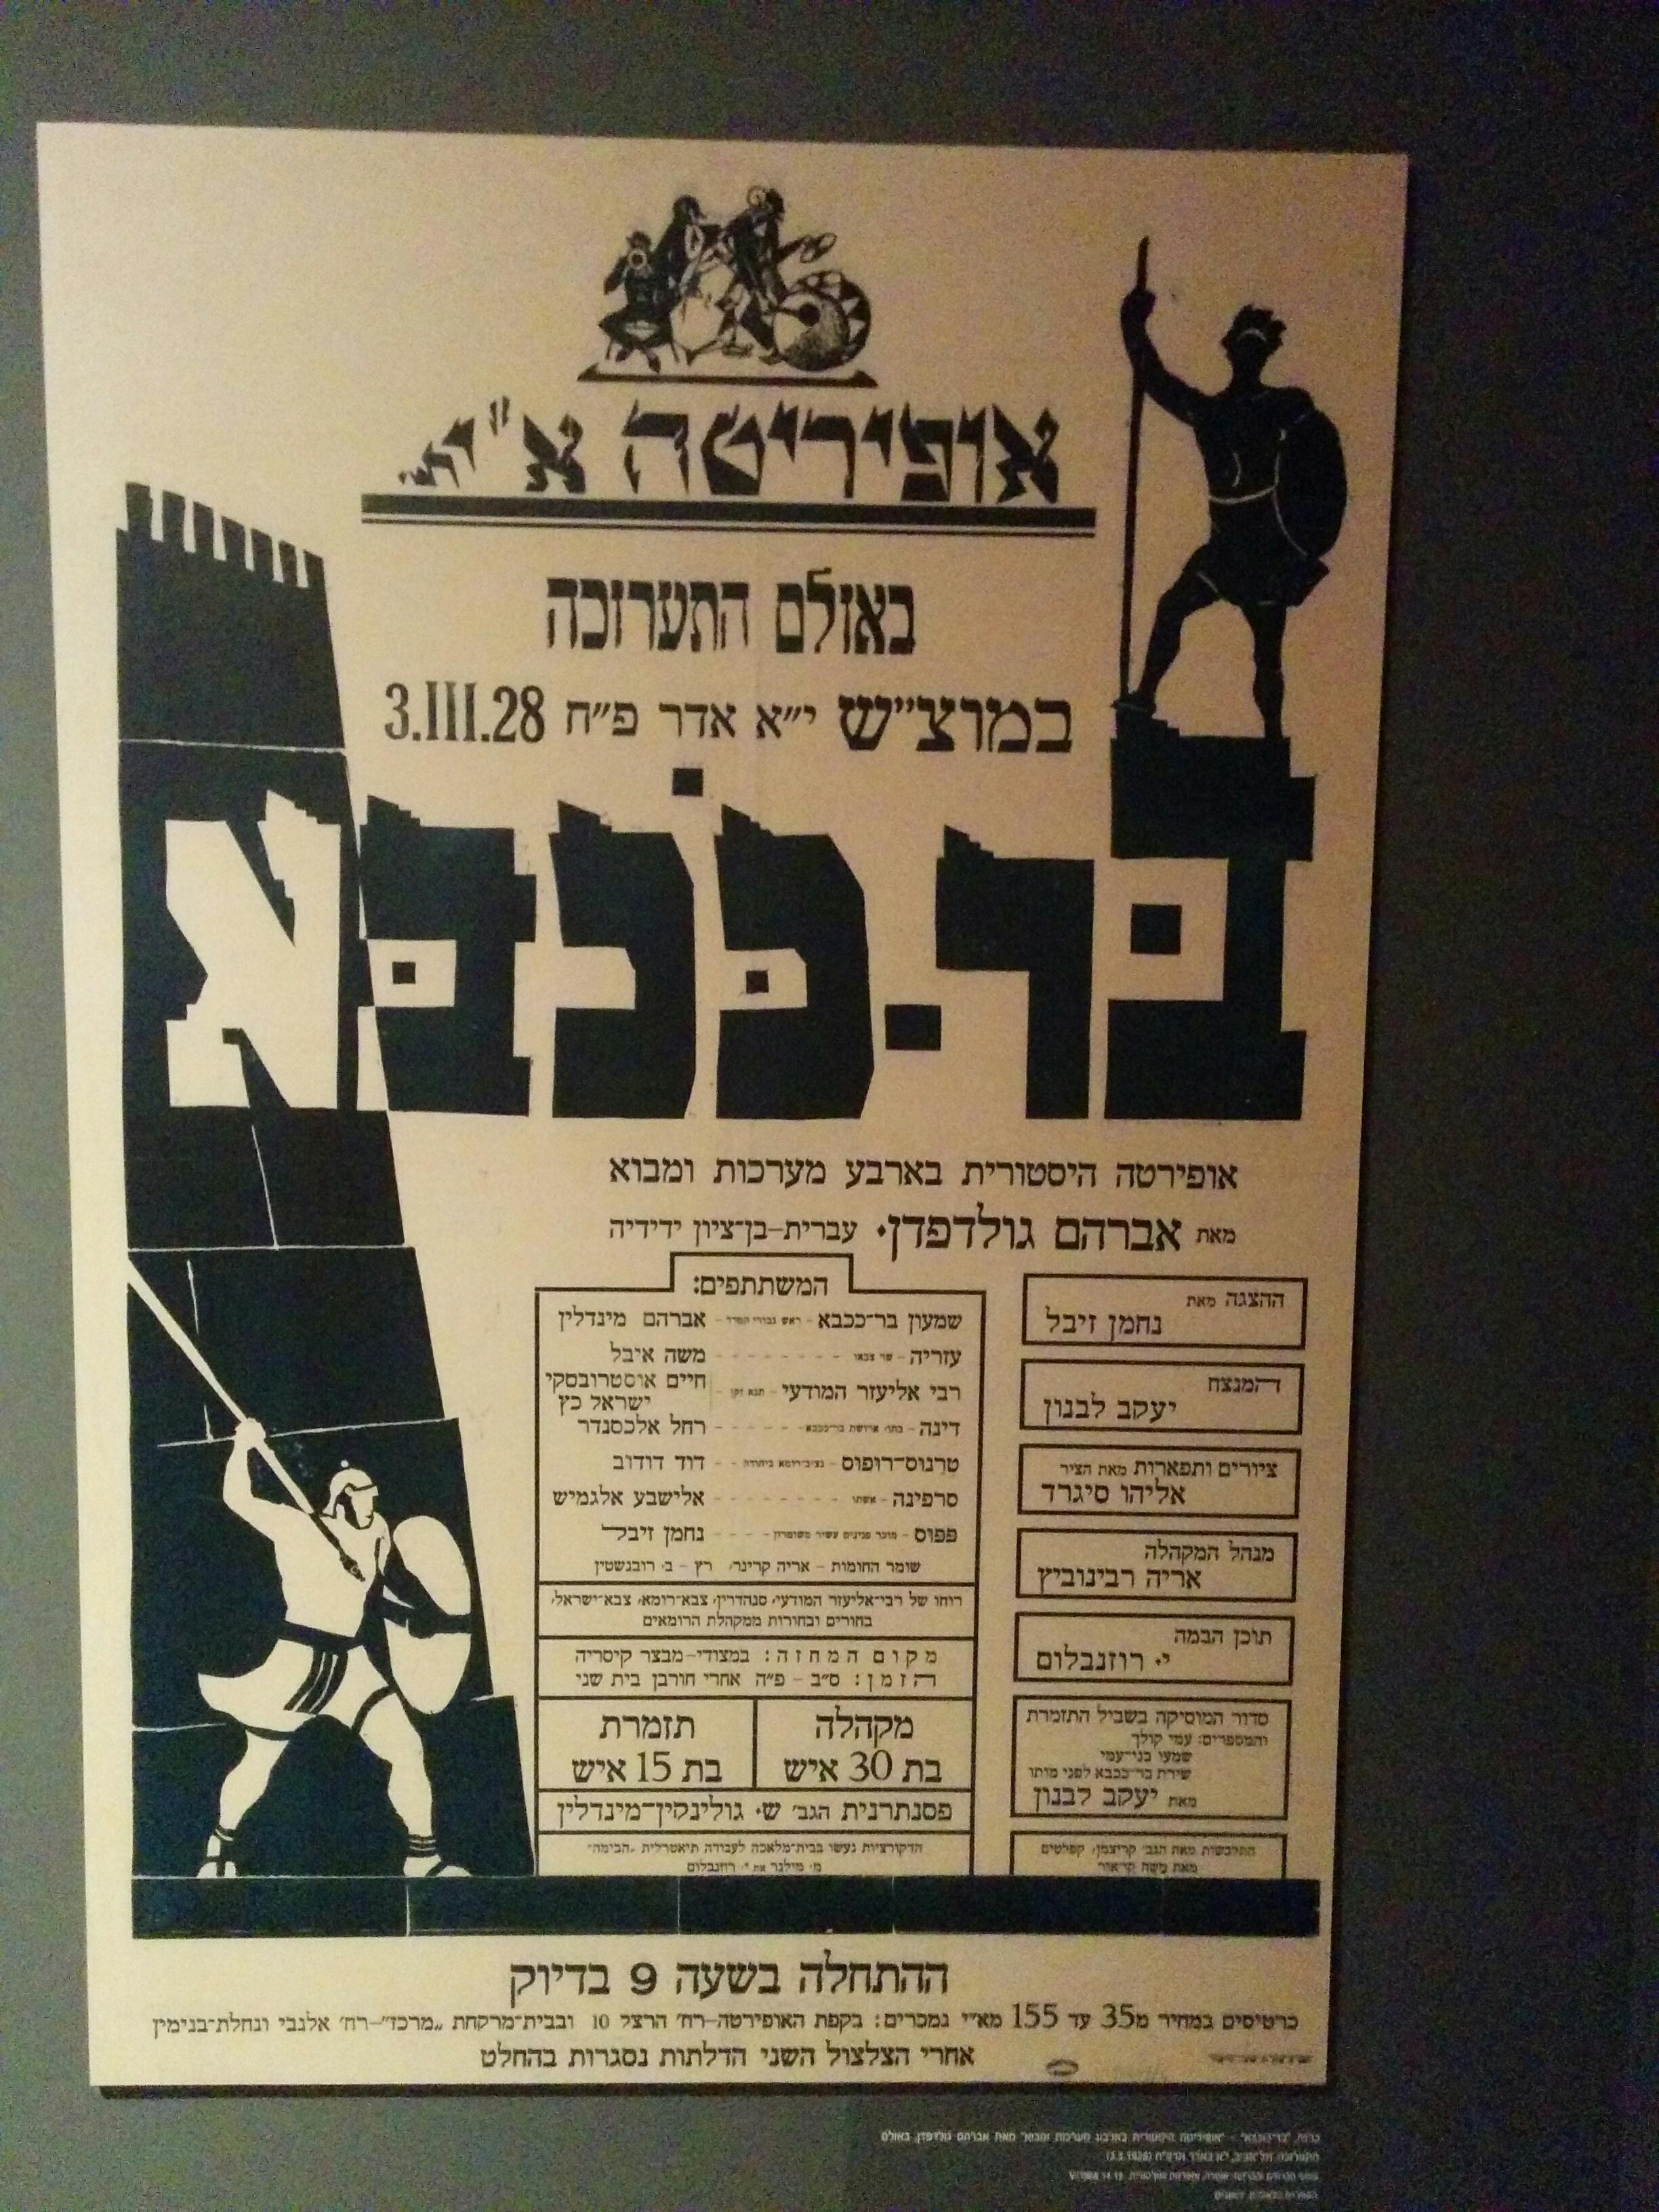 Bar Kokhba play - Shimon Bar Kokhba - Eretz Israel Museum